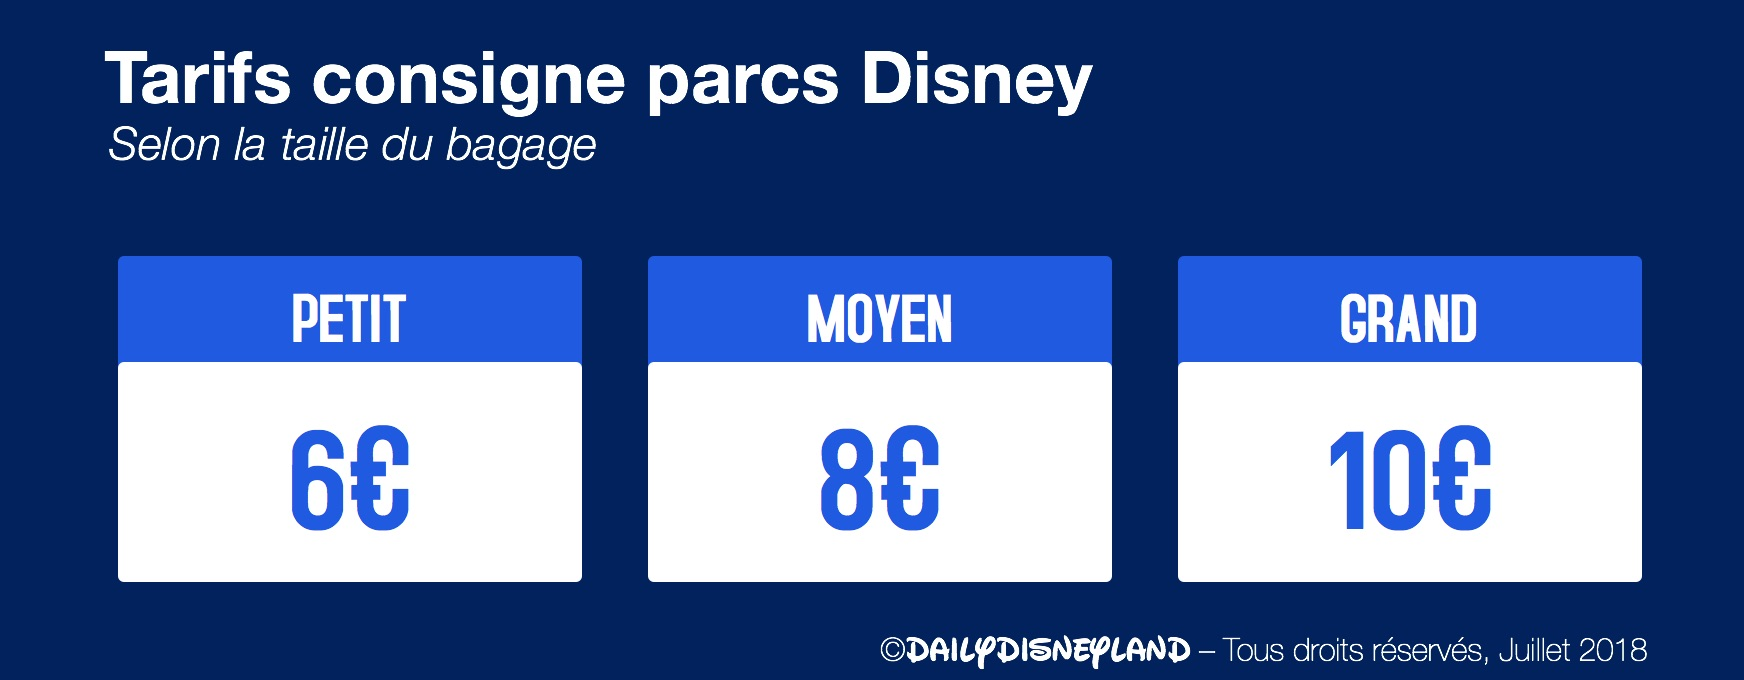 bagagerie consigne parcs disney disneyland paris sacs valises disney disney express prix daily disneyland guide coffres